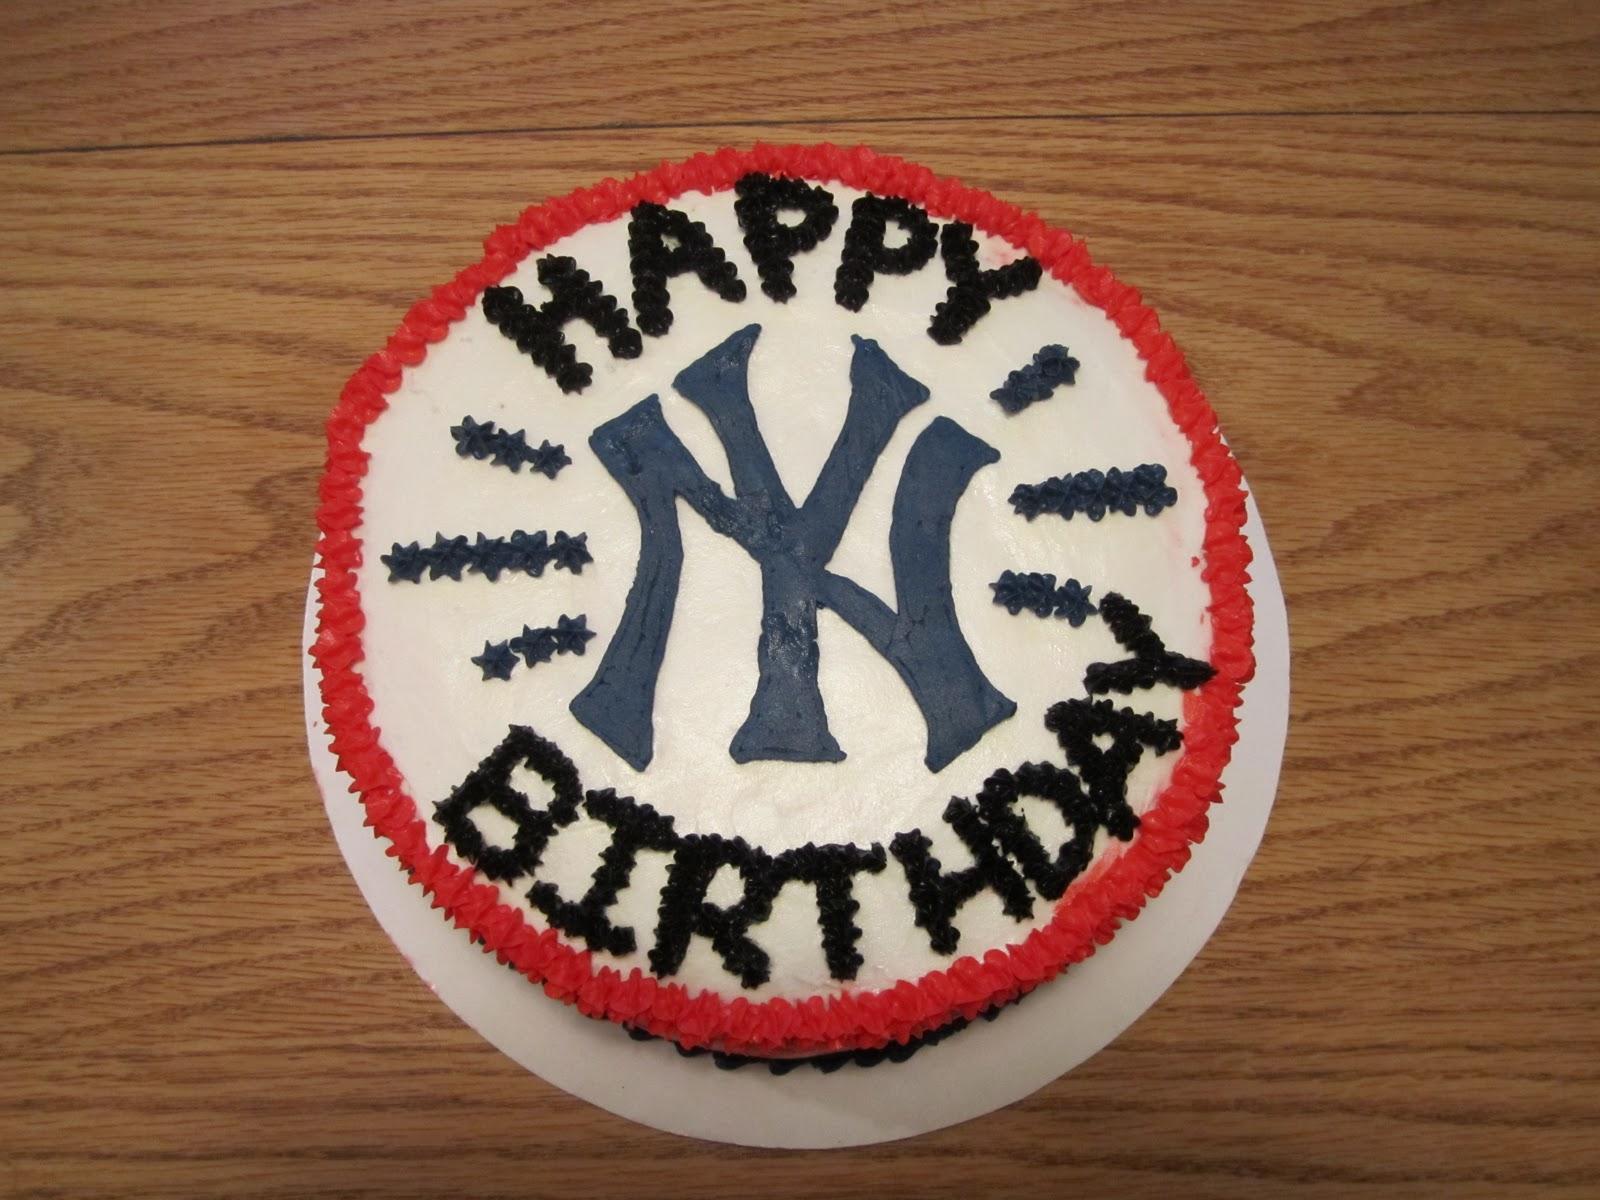 Marvelous Jessicas Sweet Side New York Yankees Cake Funny Birthday Cards Online Benoljebrpdamsfinfo